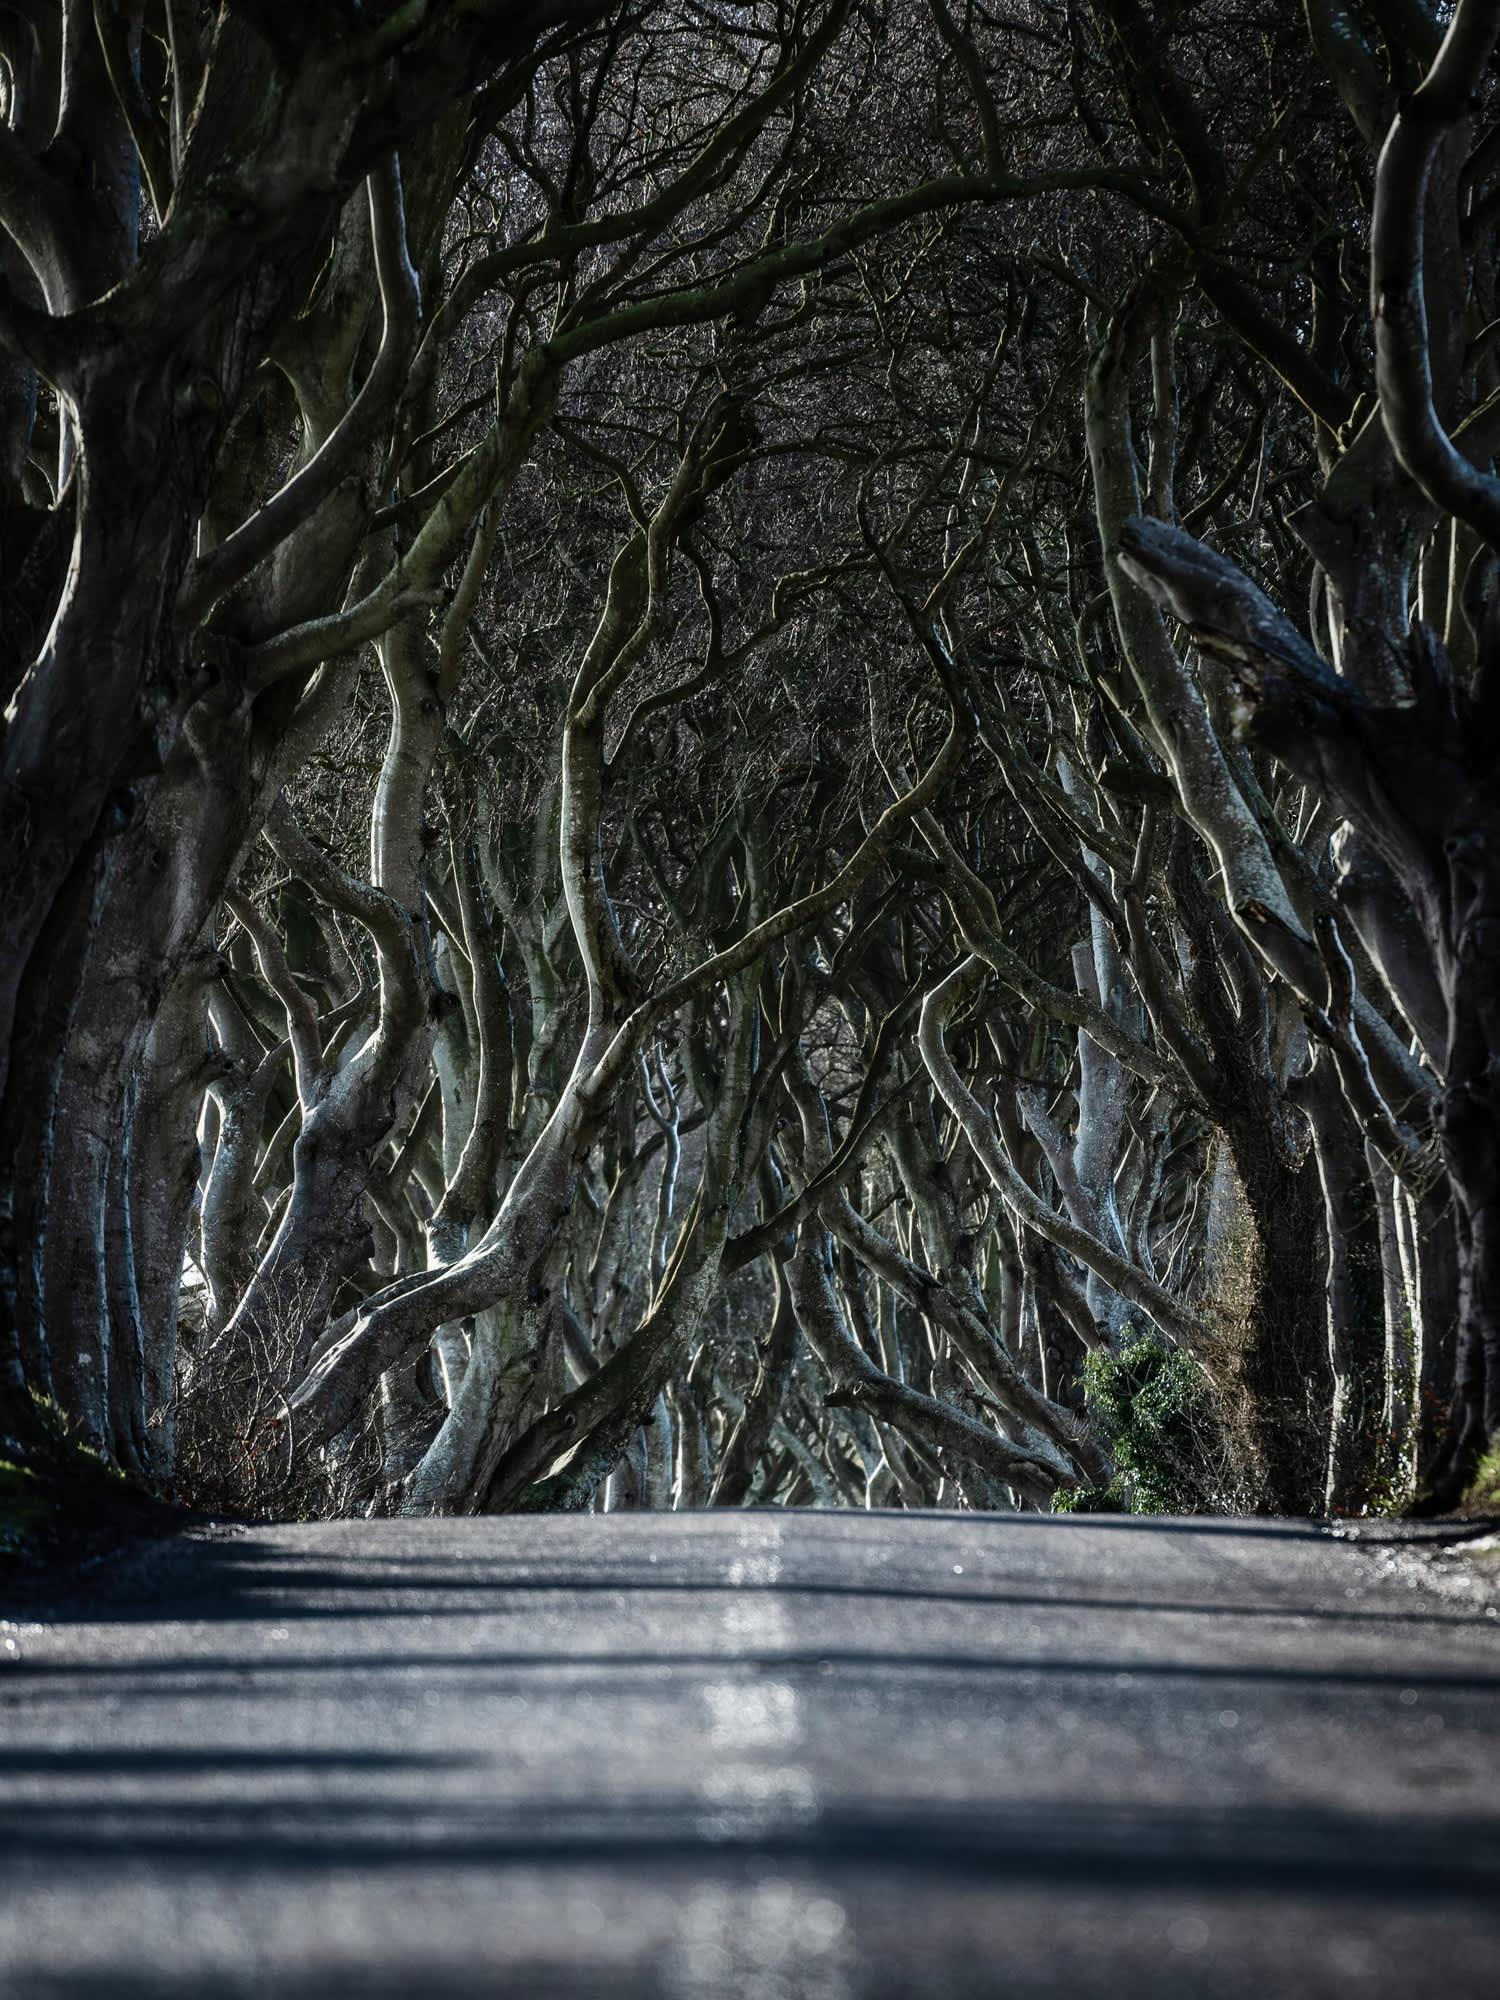 A road leading through the dark hedges Northern Ireland, United Kingdom.